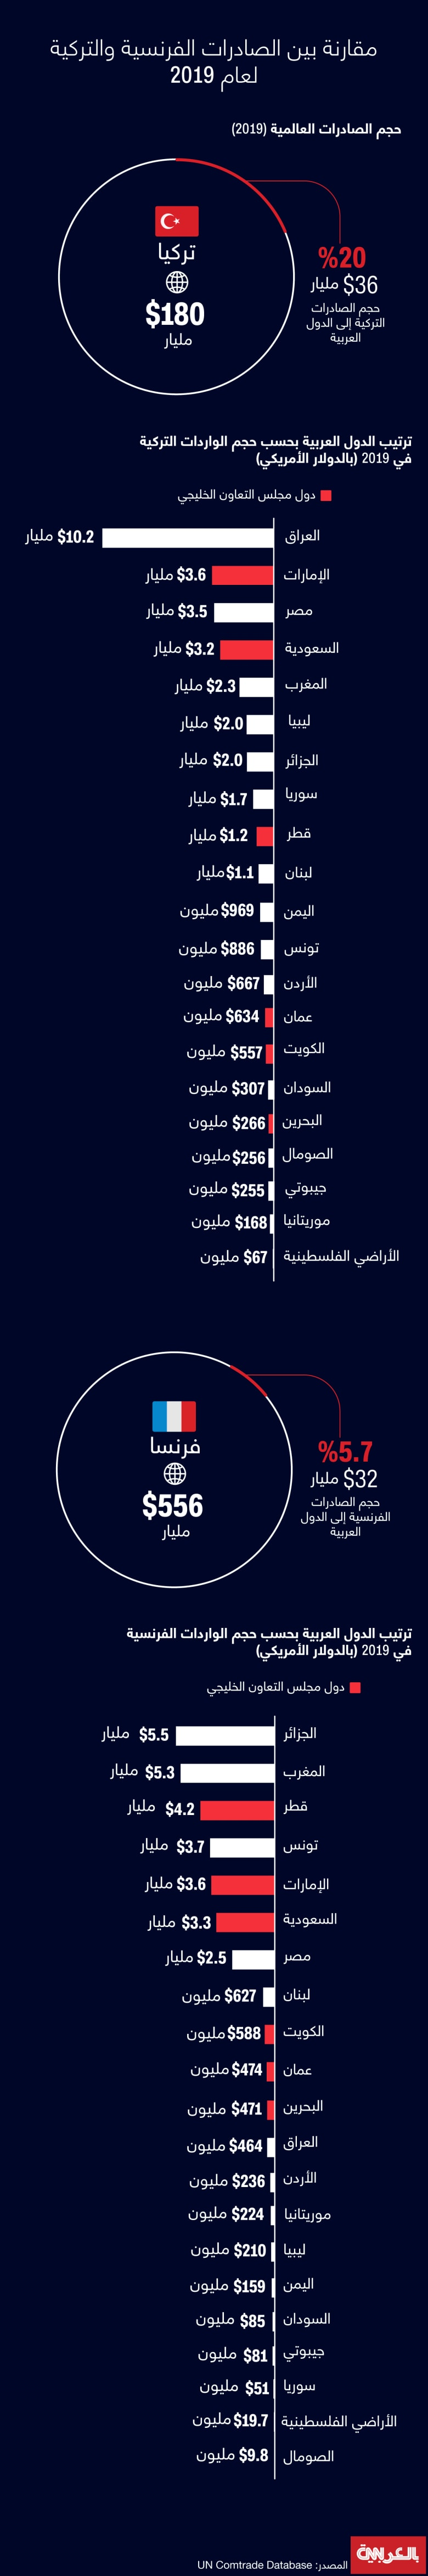 Turkey-France-exports